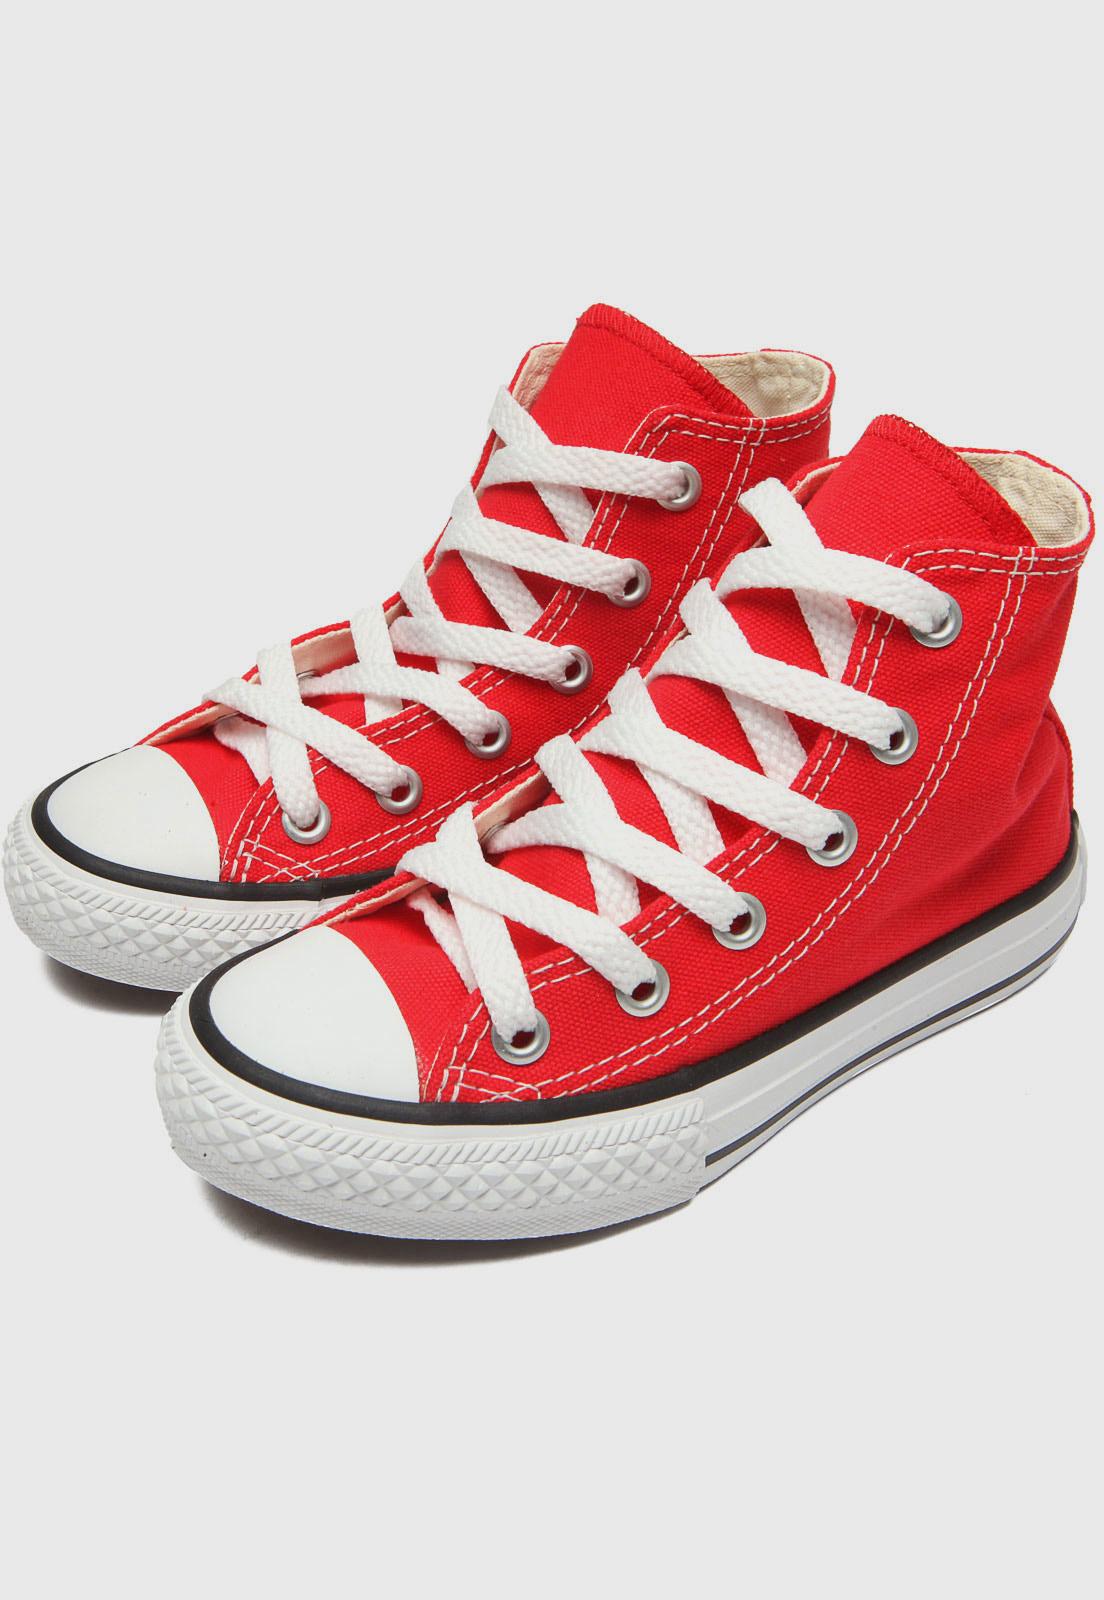 Tênis Converse Chuck Taylor All Star Vermelho ck00040004